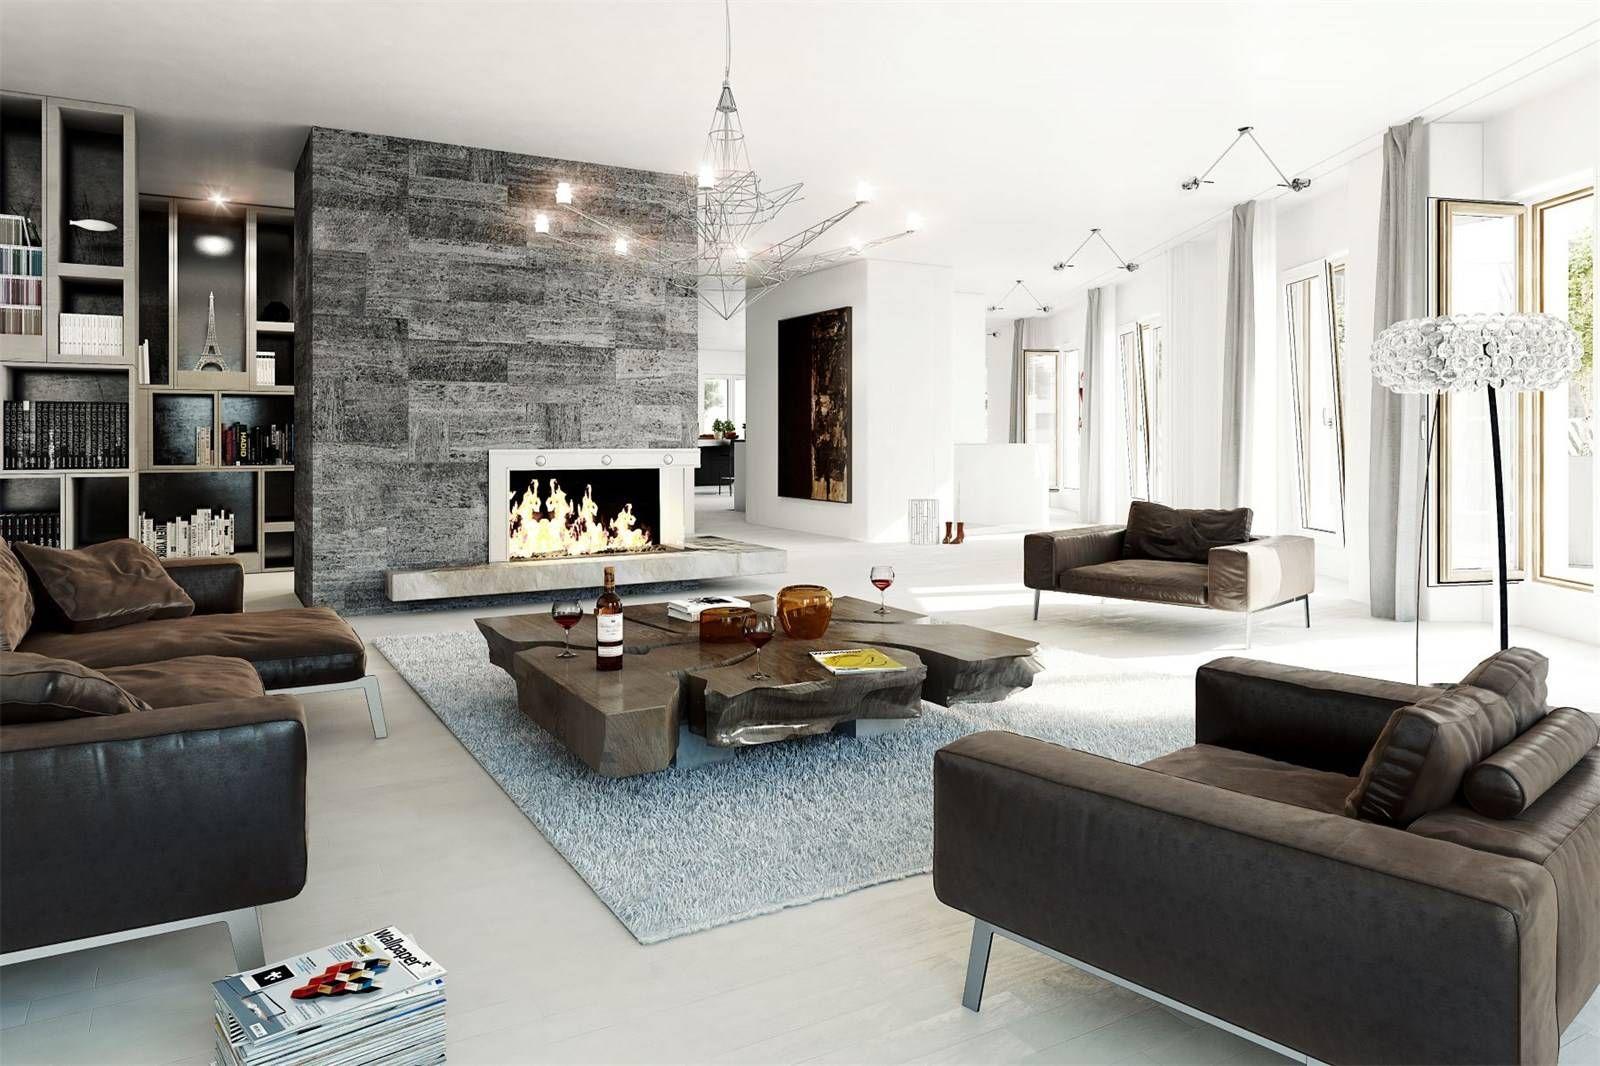 Elegant Theresienstraße 71 A   75 Munich, Bavaria, Germany U2013 Luxury Home For Sale